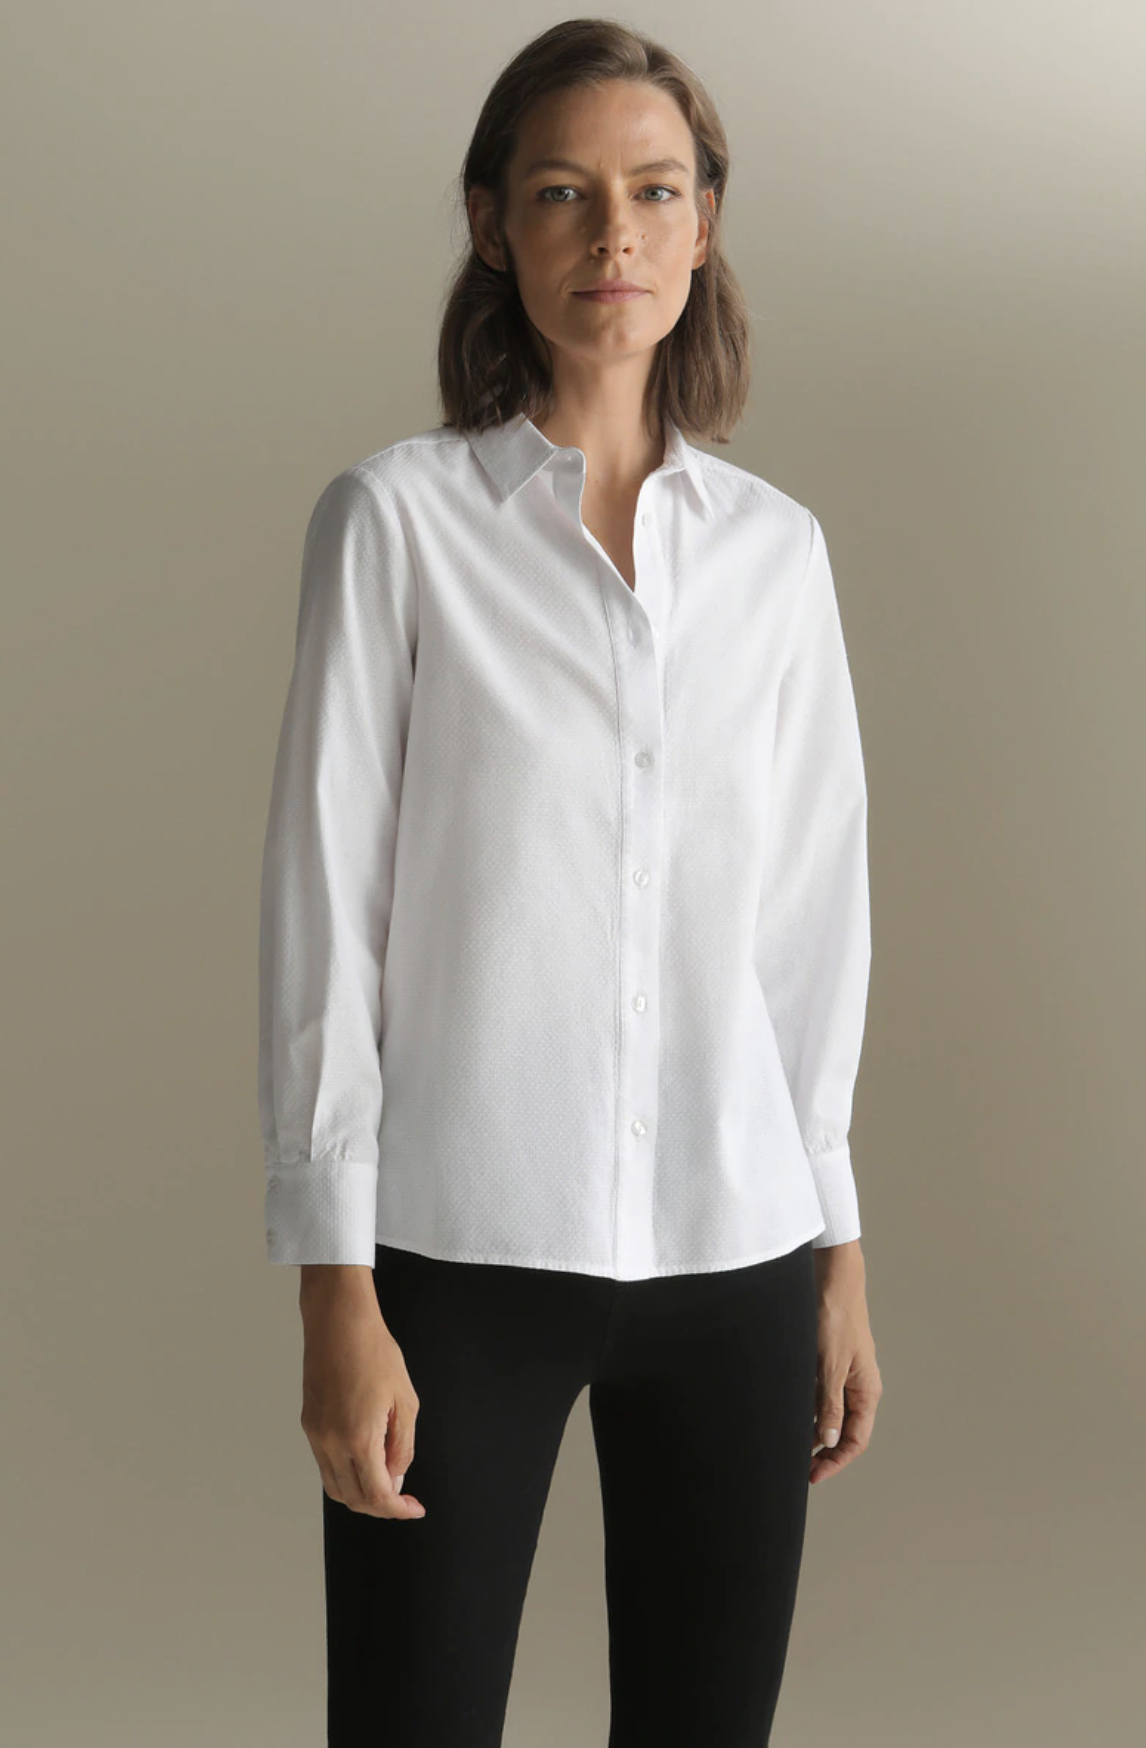 Camisa de mujer Woman Sport 100% algodón manga larga